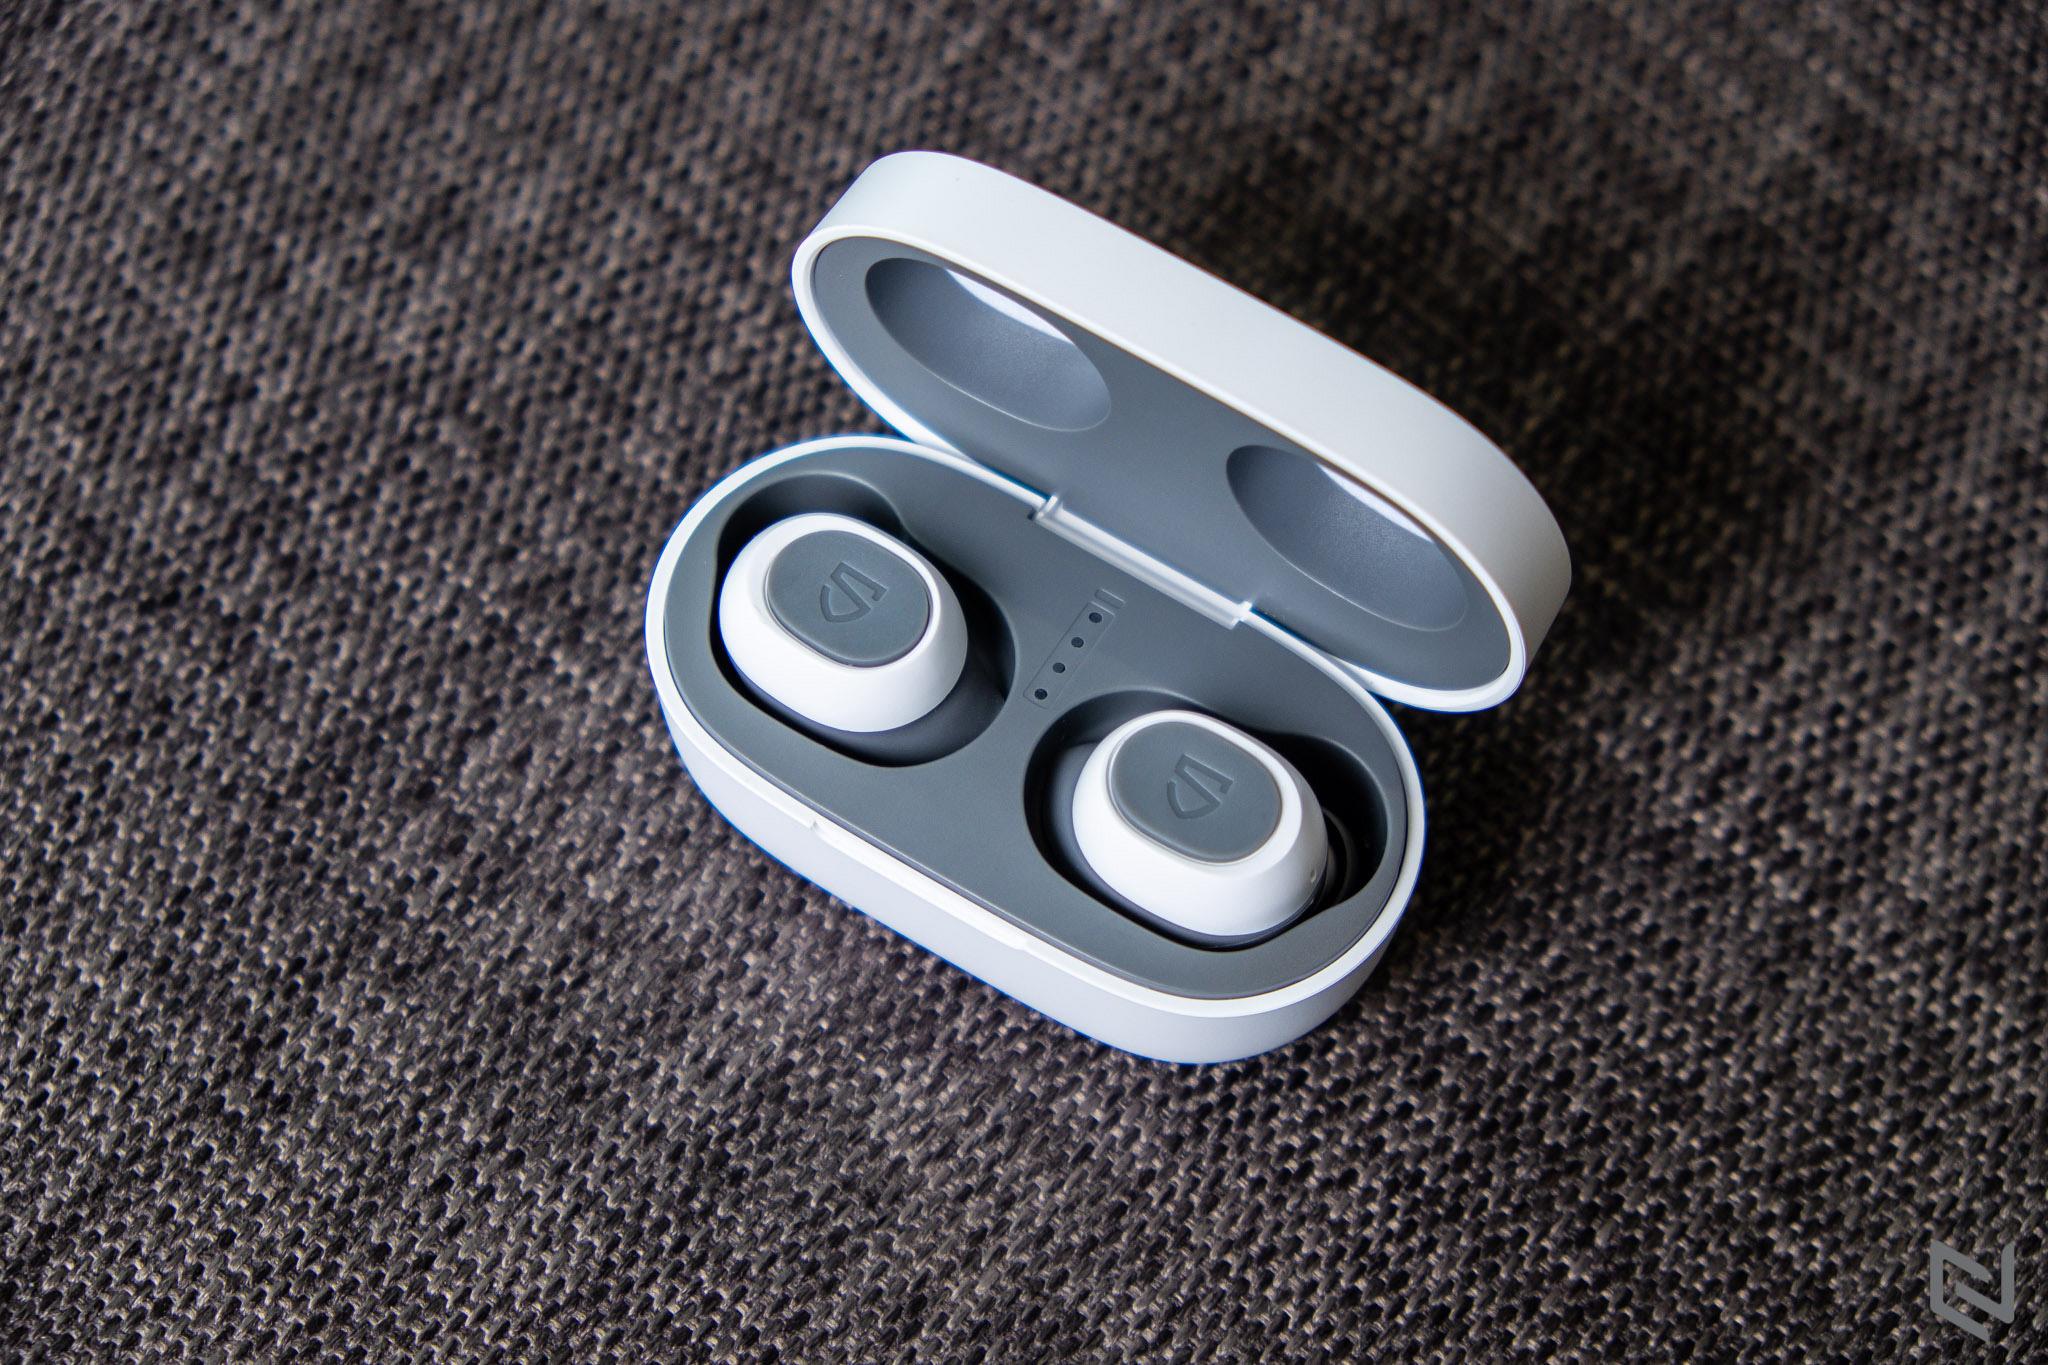 Đánh giá Soundpeats TrueFree 2